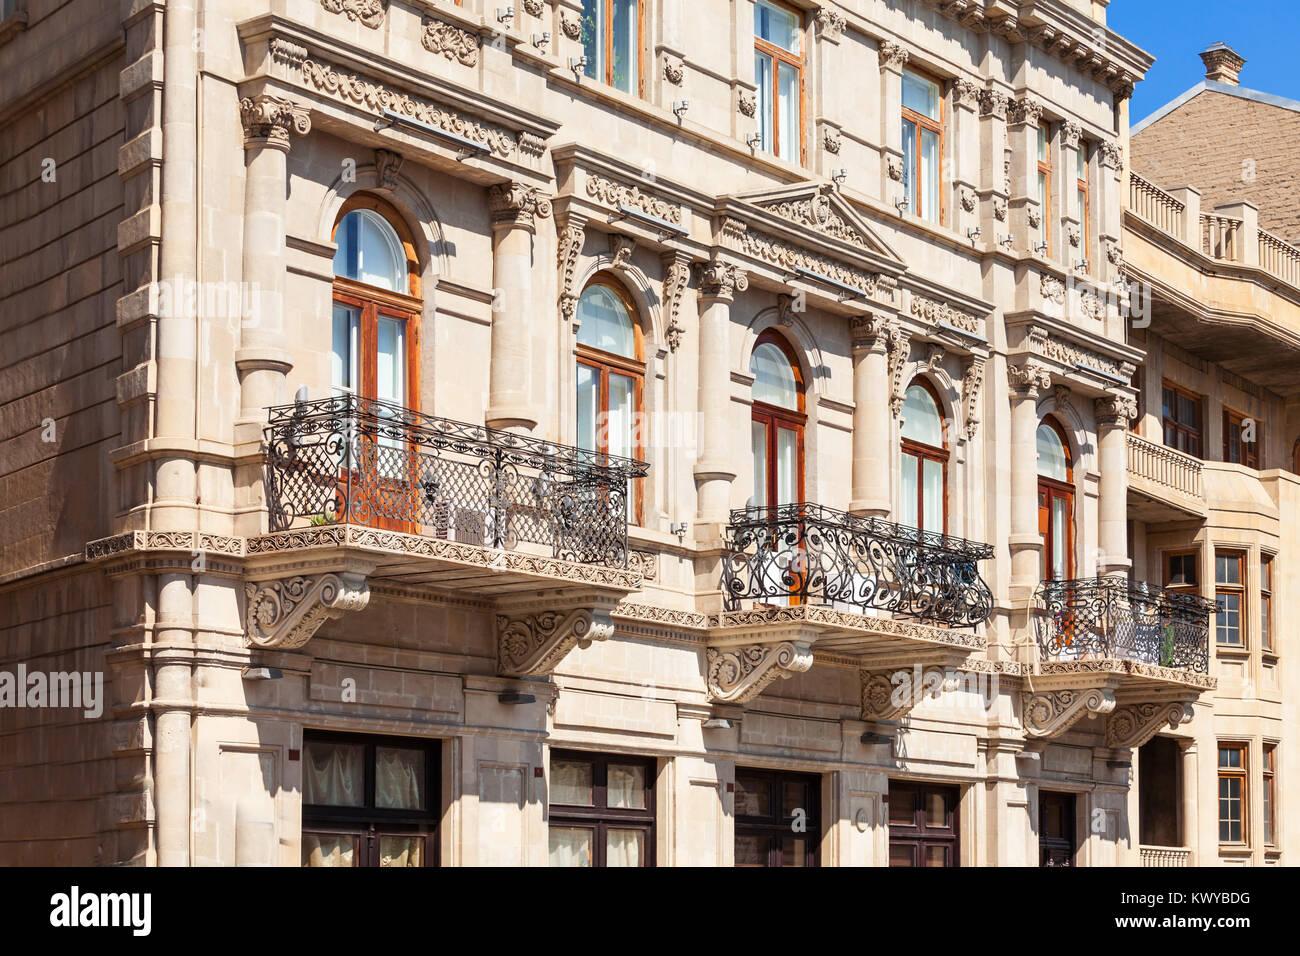 The Old City Icheri Sheher in Baku, Azerbaijan. Inner City is the historical core of Baku and UNESCO World Heritage - Stock Image